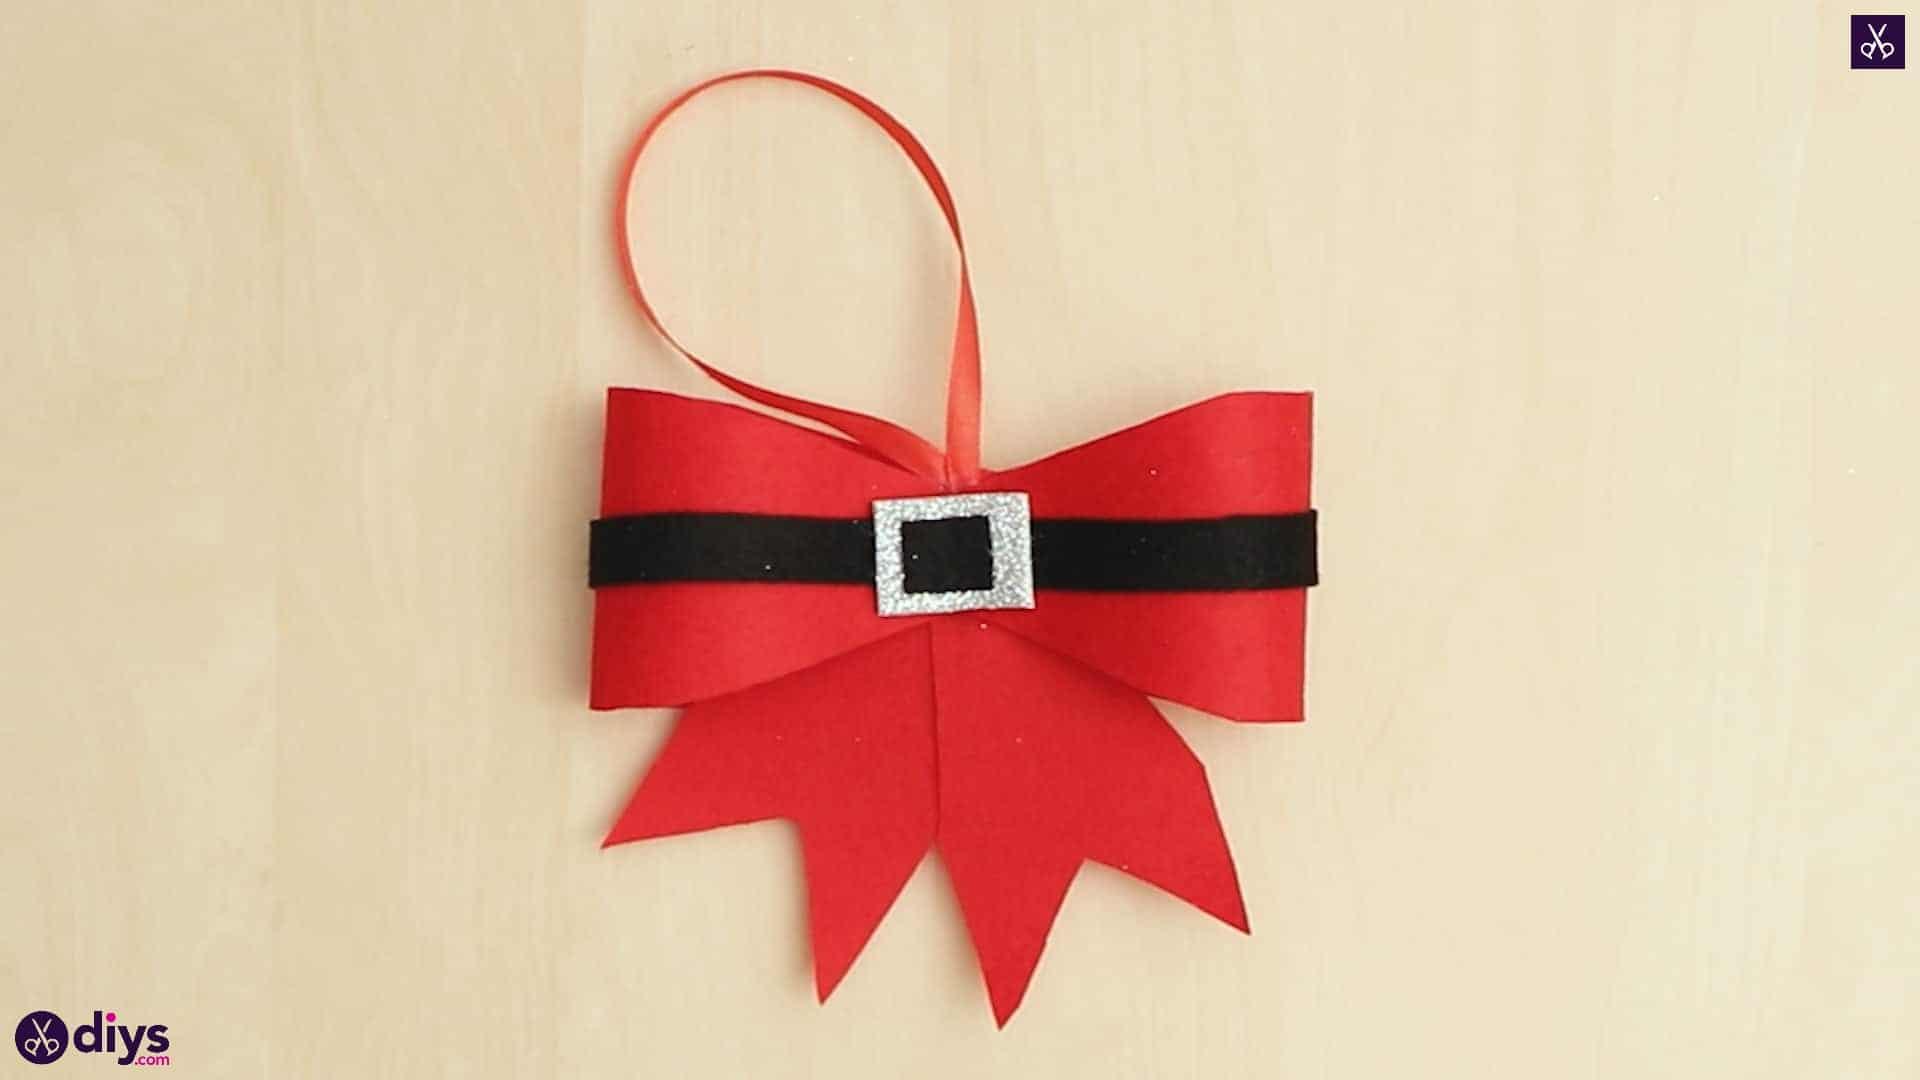 Diy christmas bow ornament